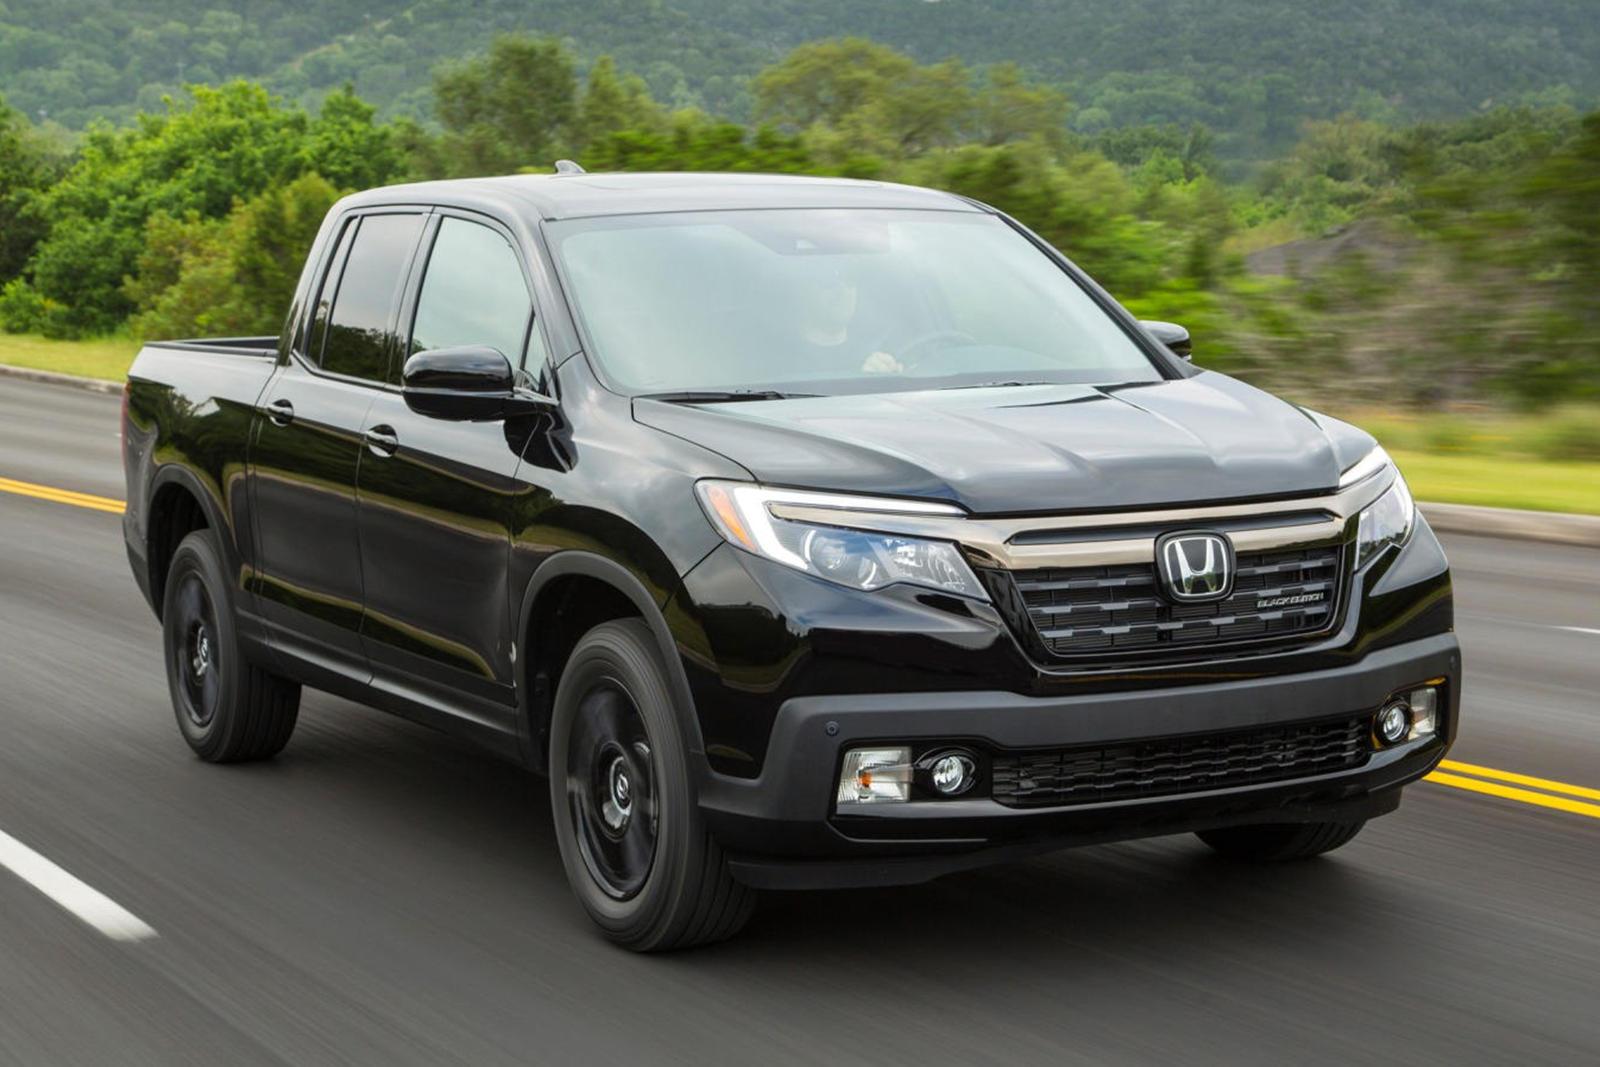 Honda Ridgeline 2020 1570700084192.jpg